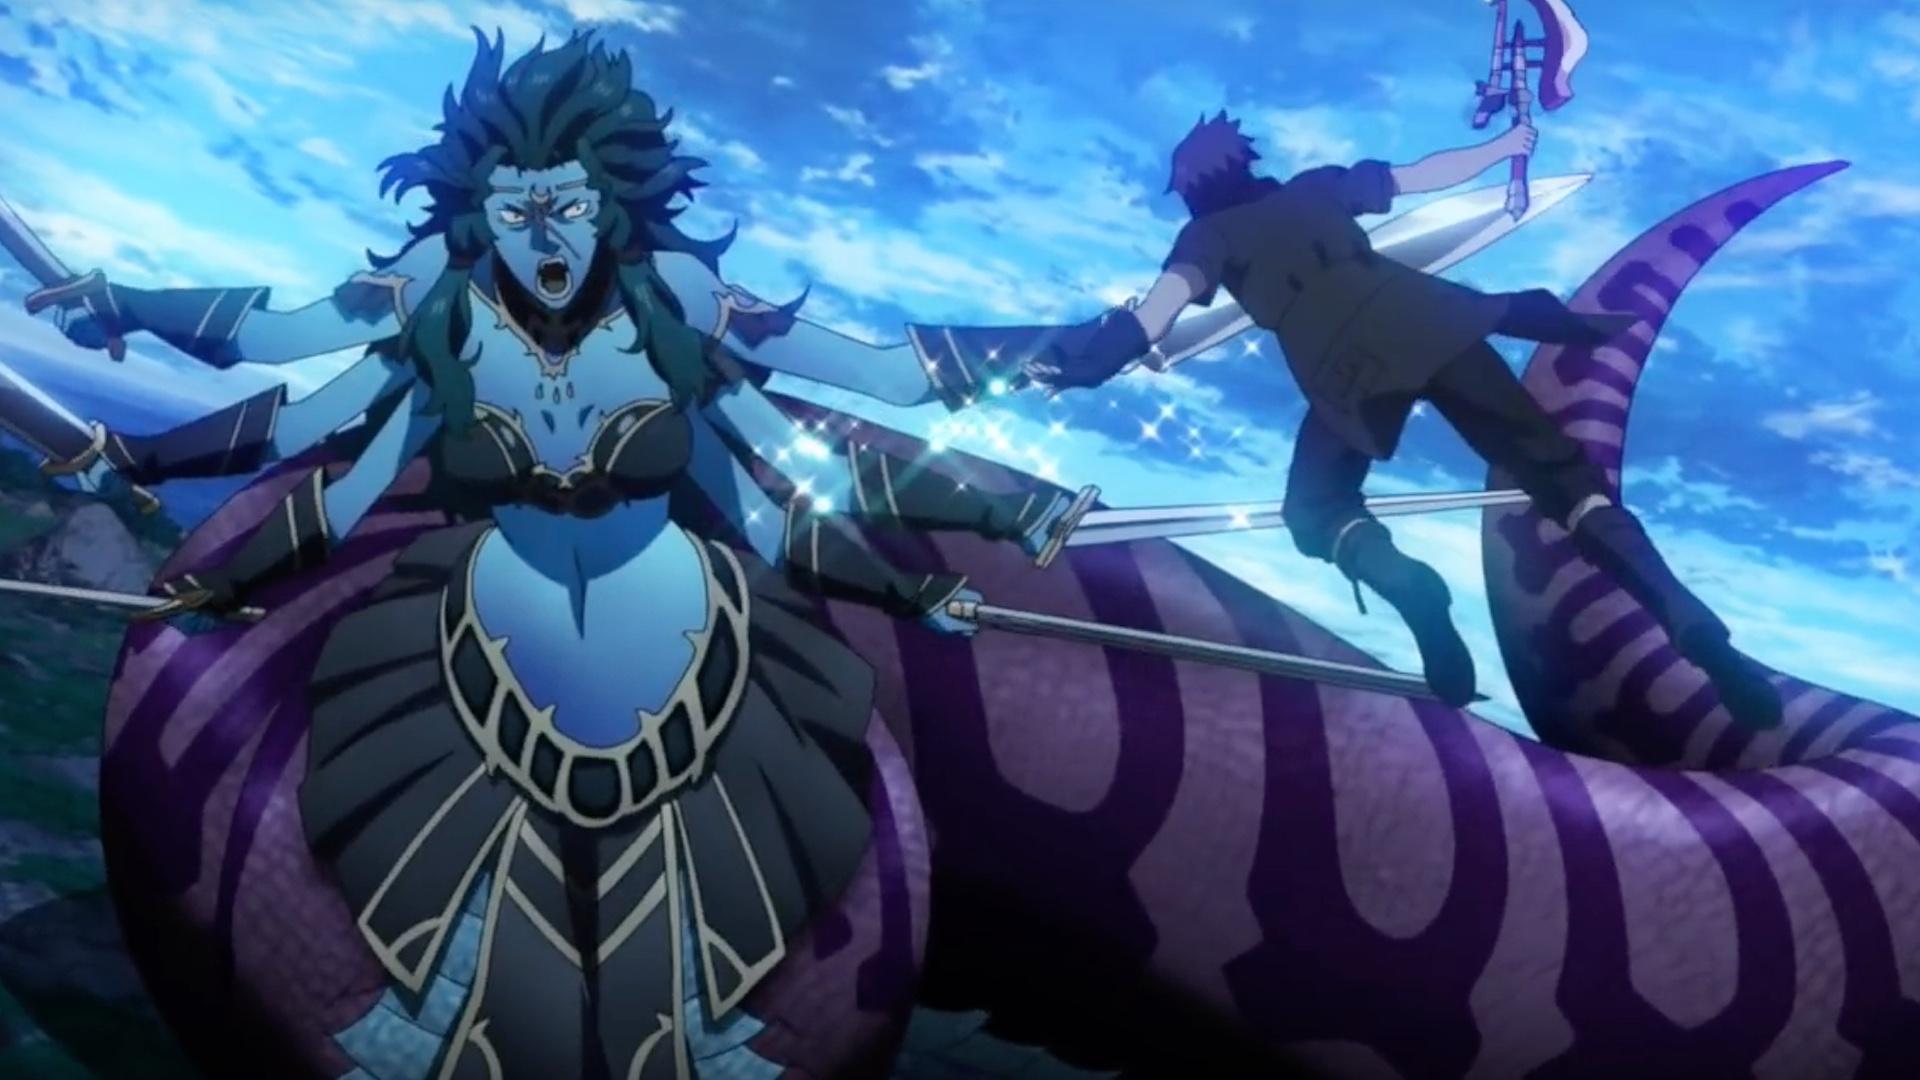 First Episode Of Final Fantasy Xv Anime Series Brotherhood